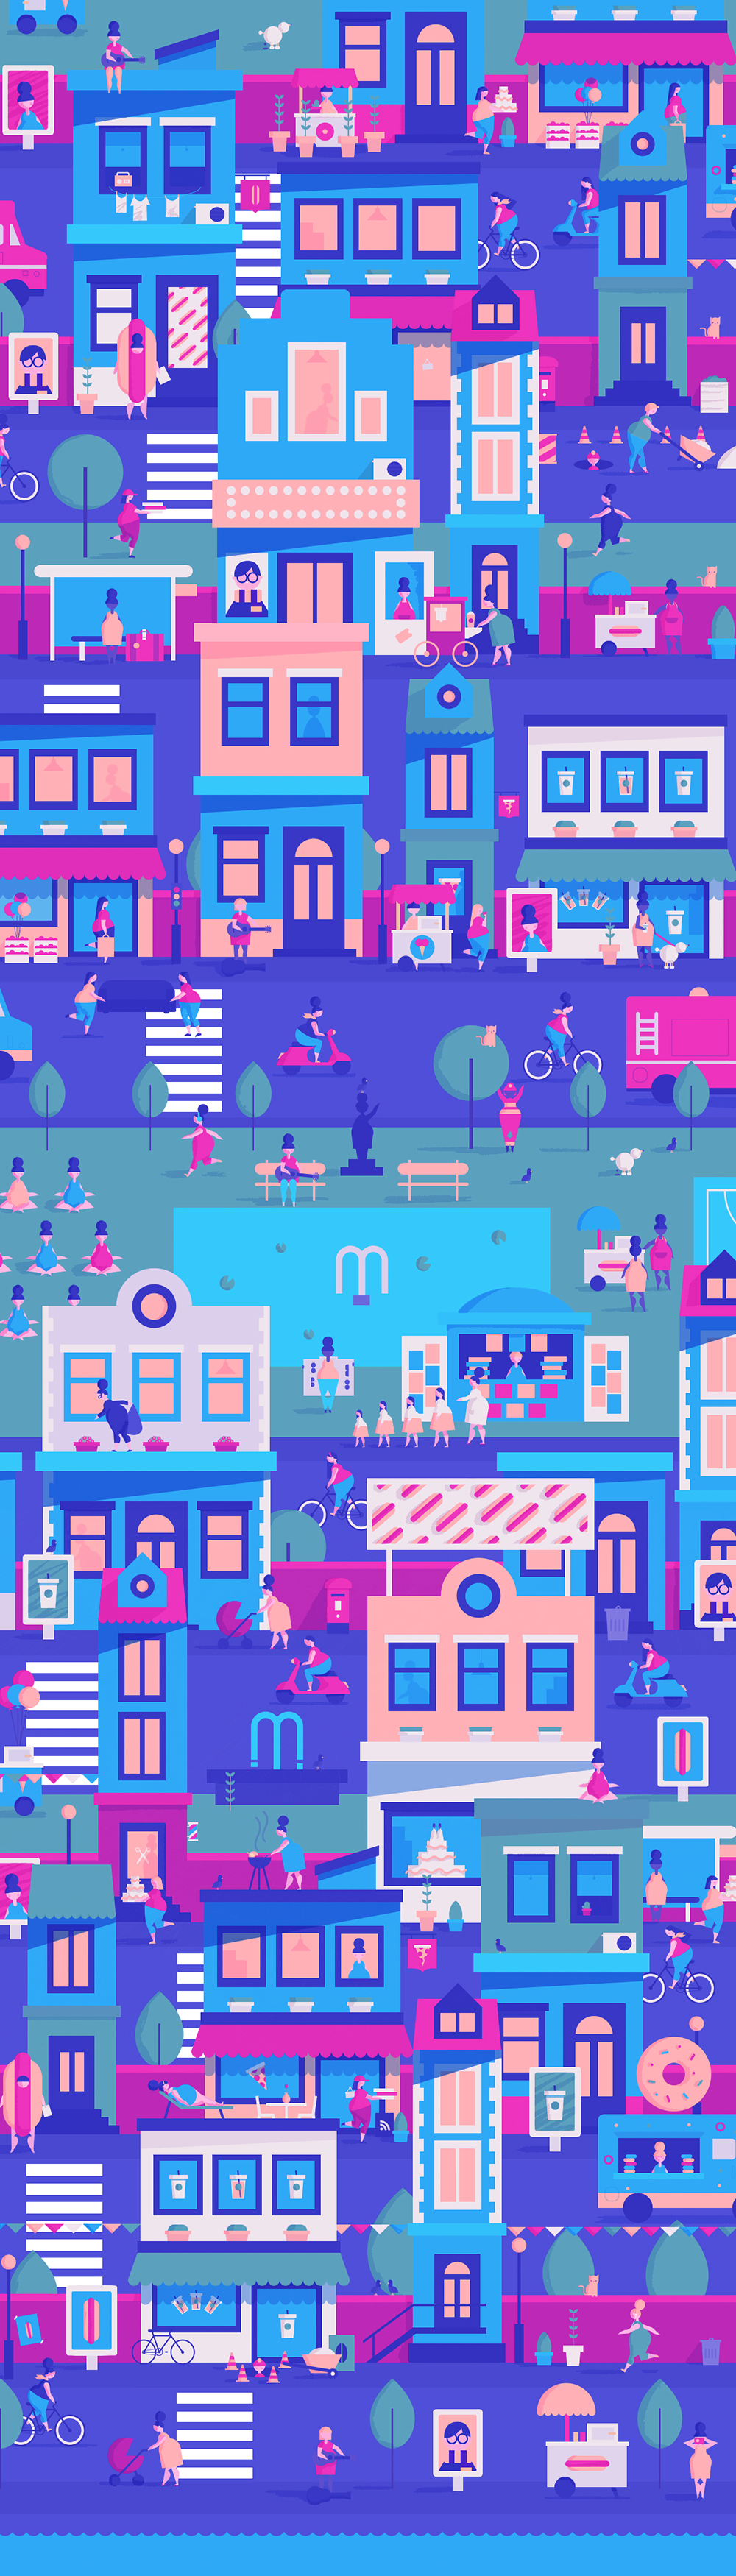 city_1000